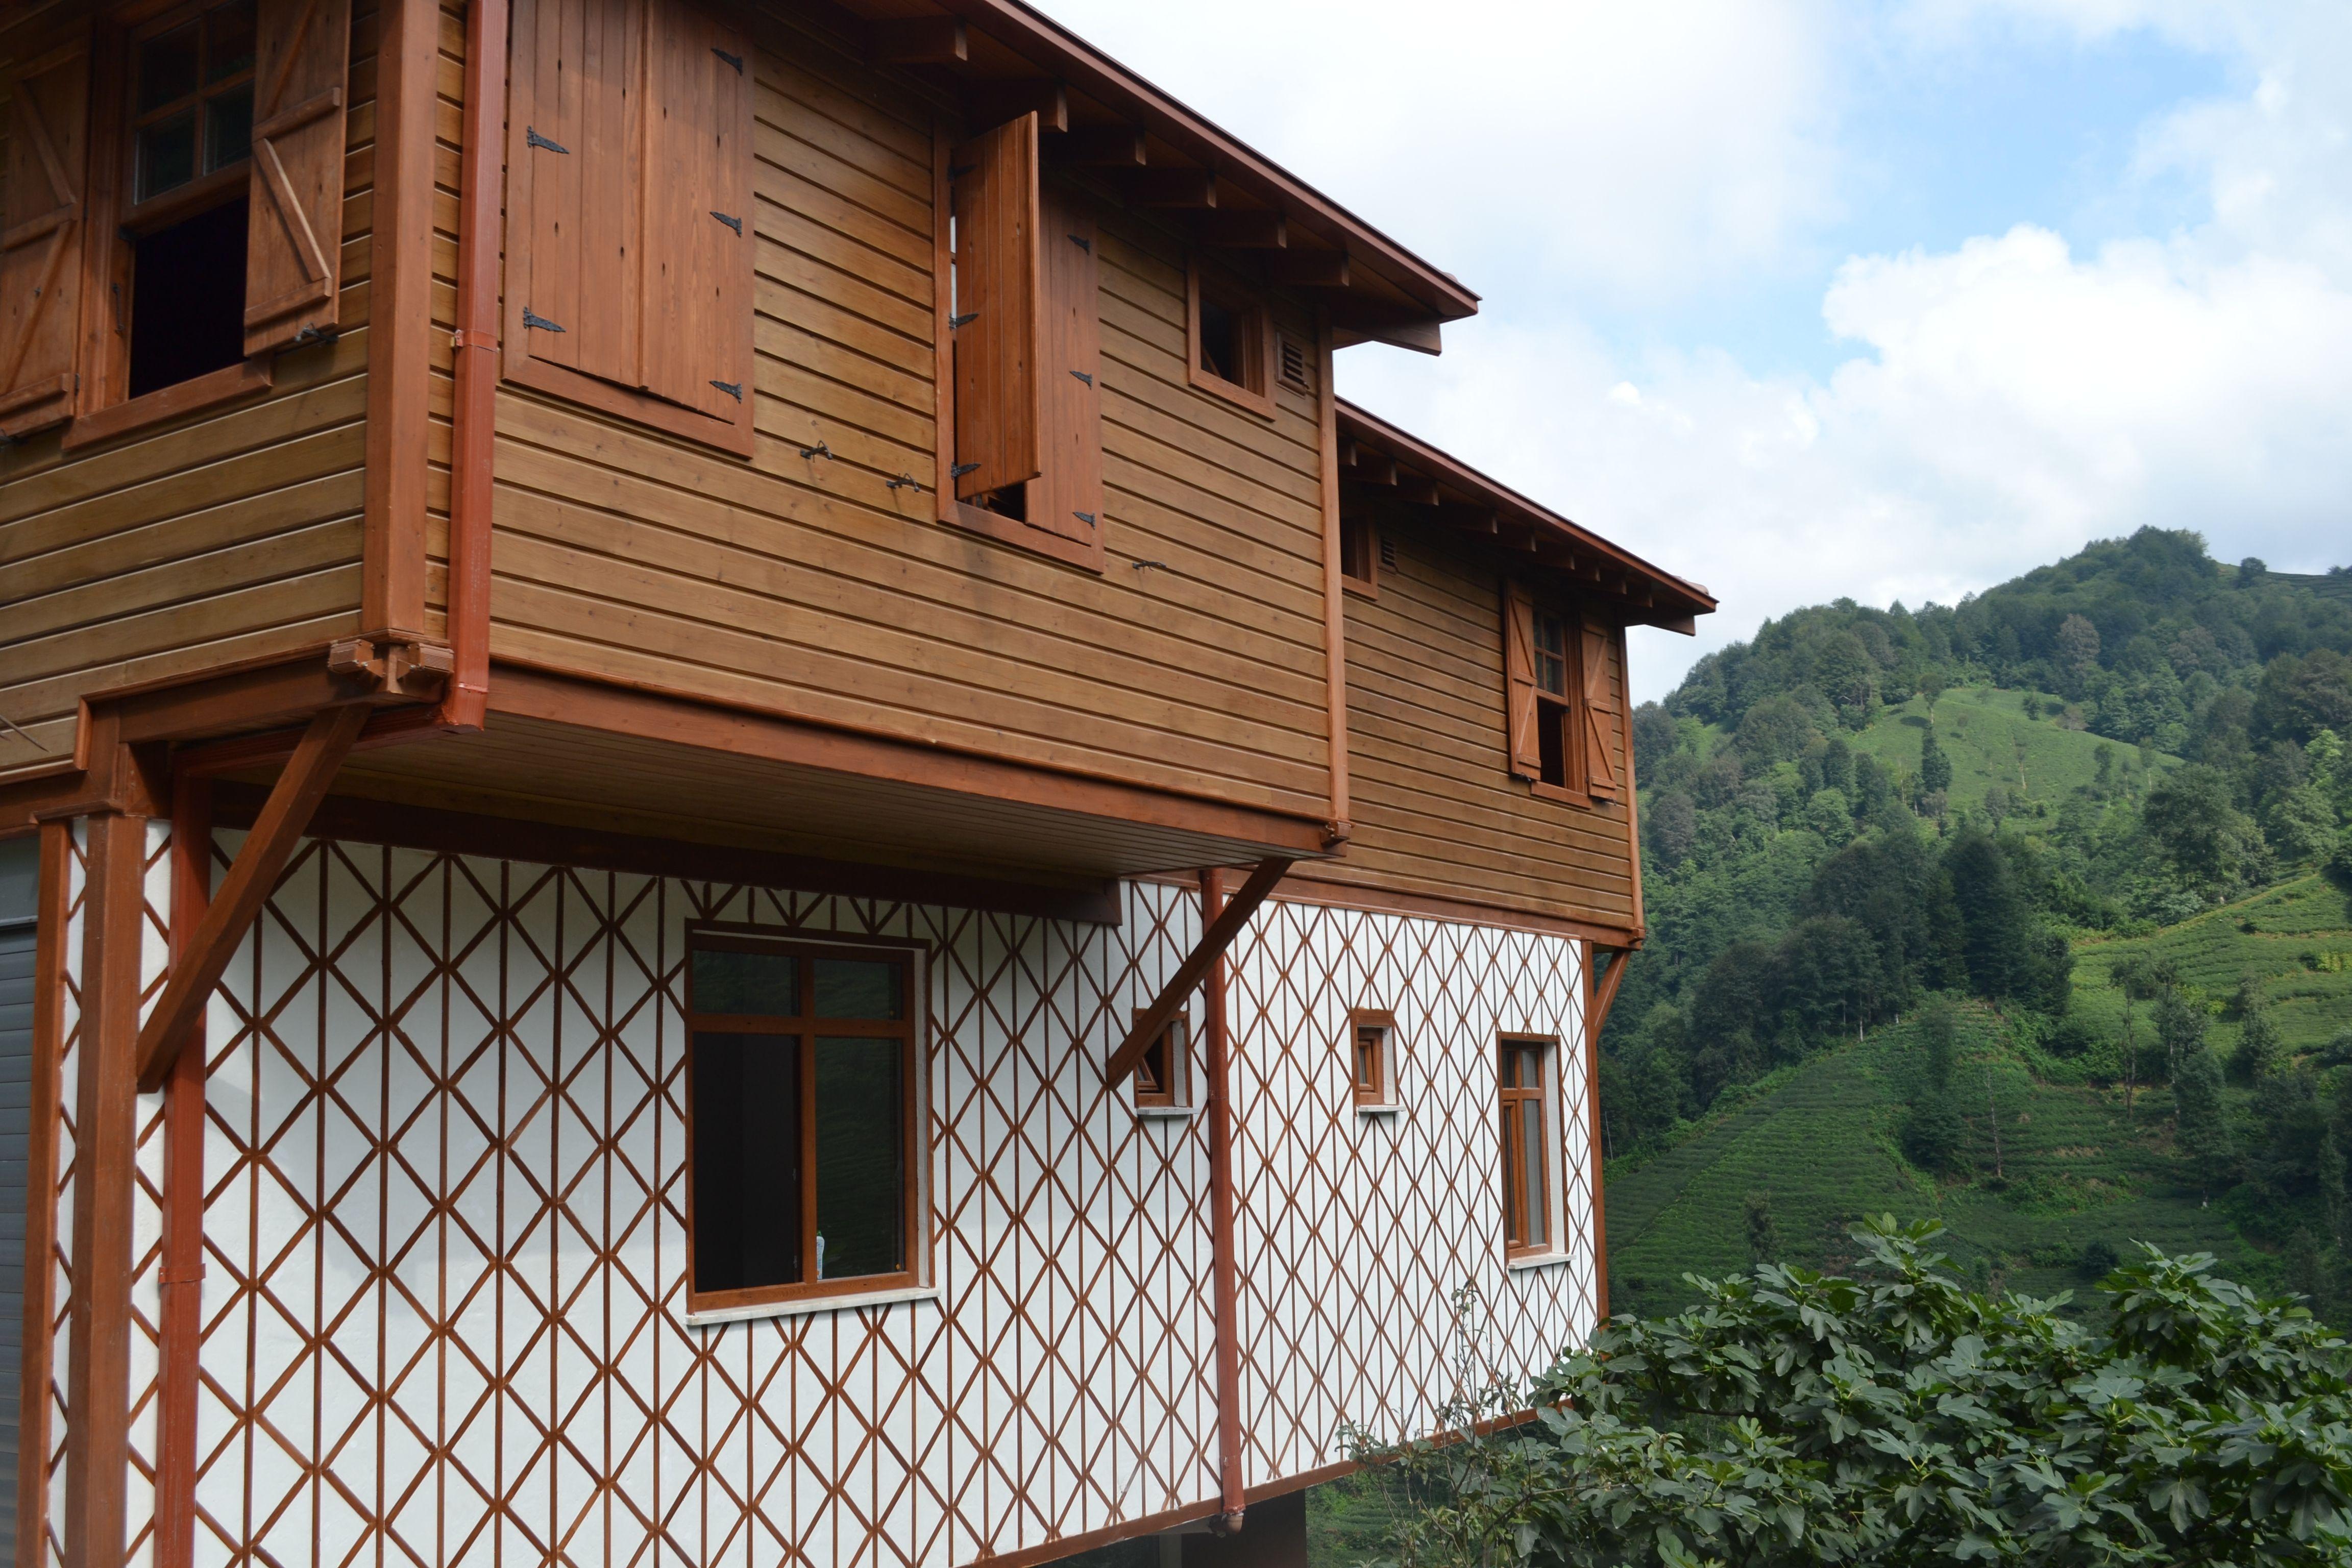 Ahsap Ev Modelleri Wooden House Models 2020 Home Fashion Ahsap Evler House